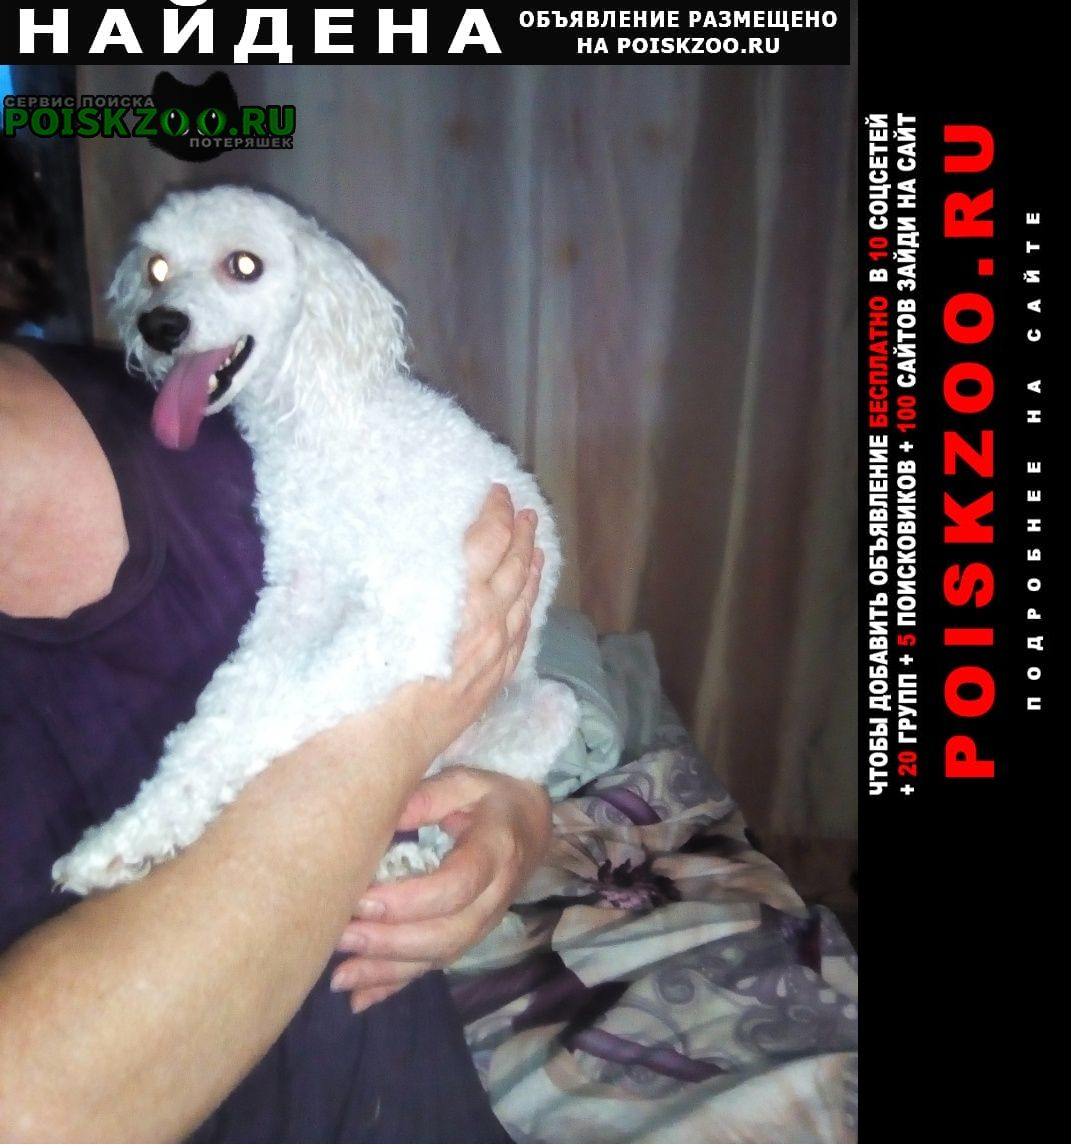 Владивосток Найдена собака кобель 03.07. карликового пуделя